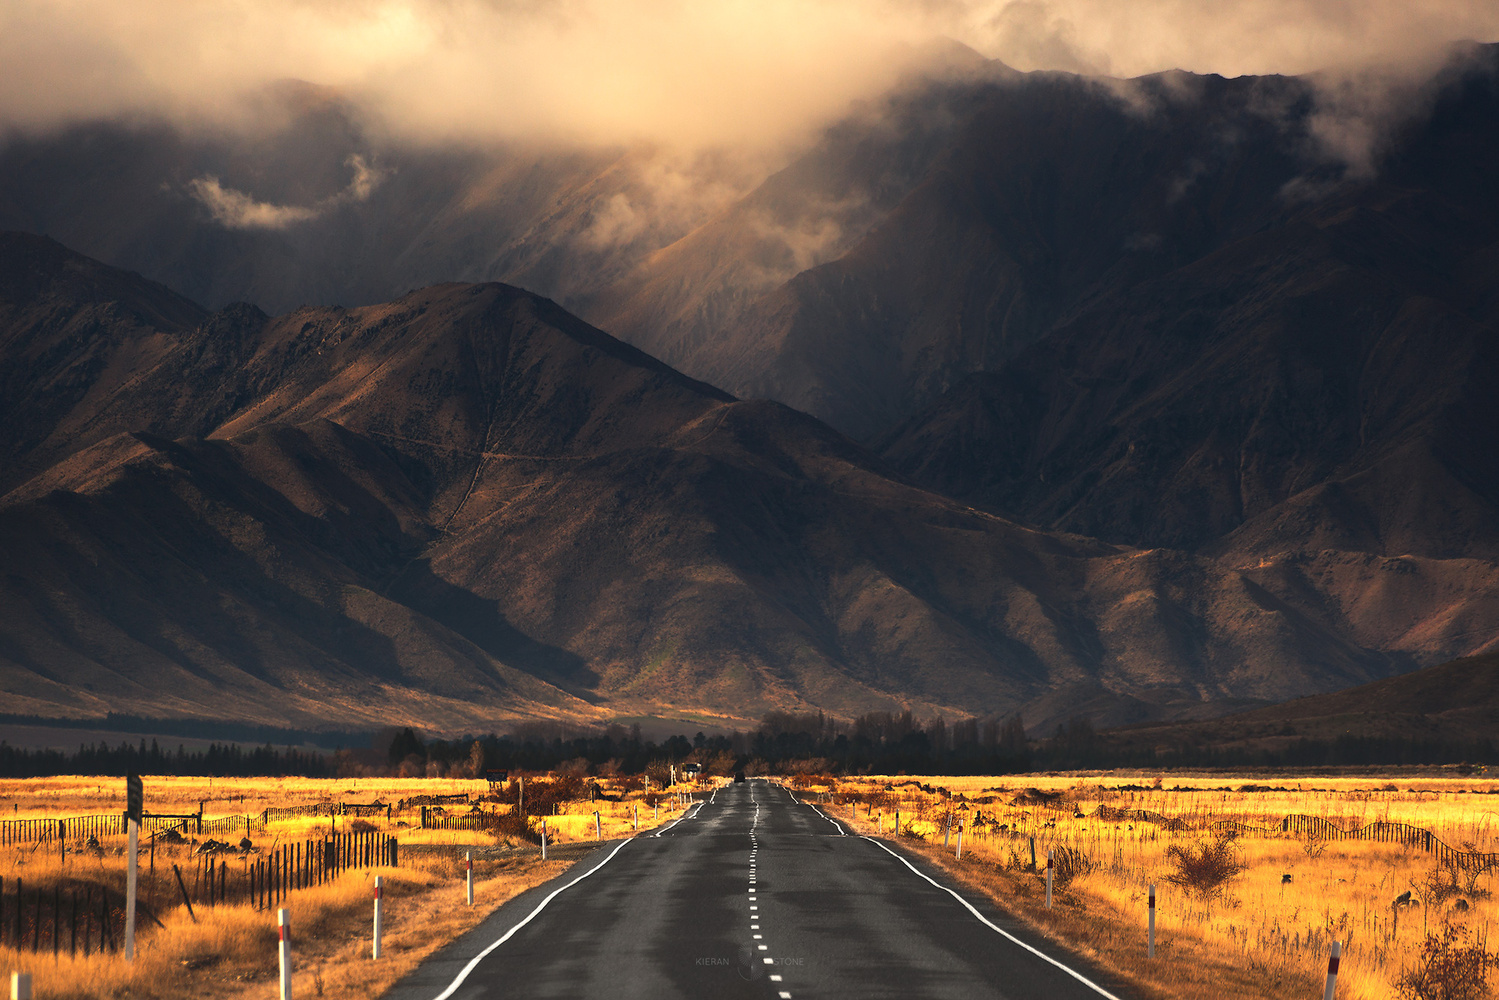 On the road by Kieran Stone